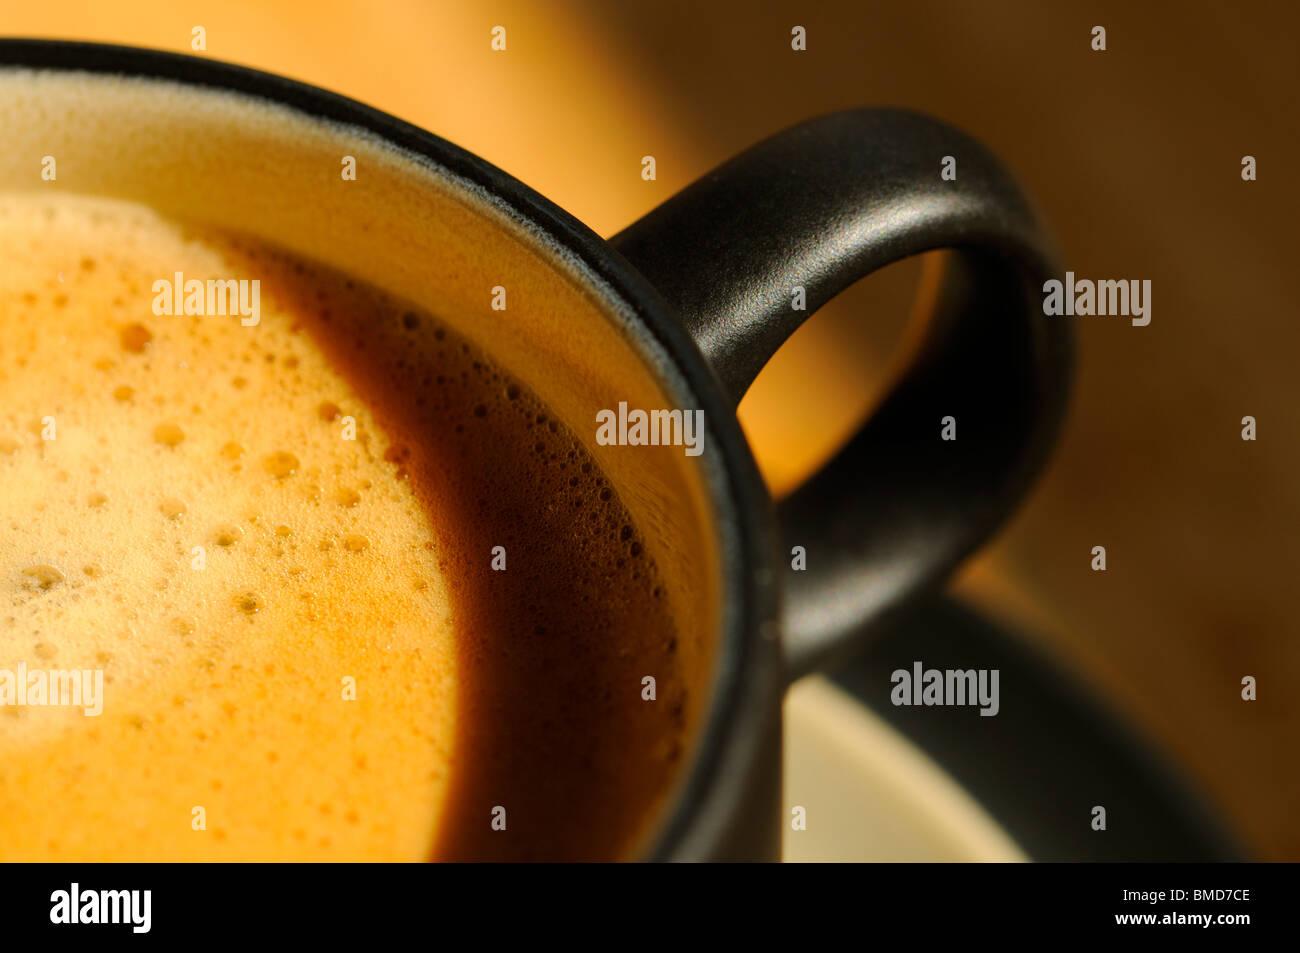 Espresso Coffee - Stock Image